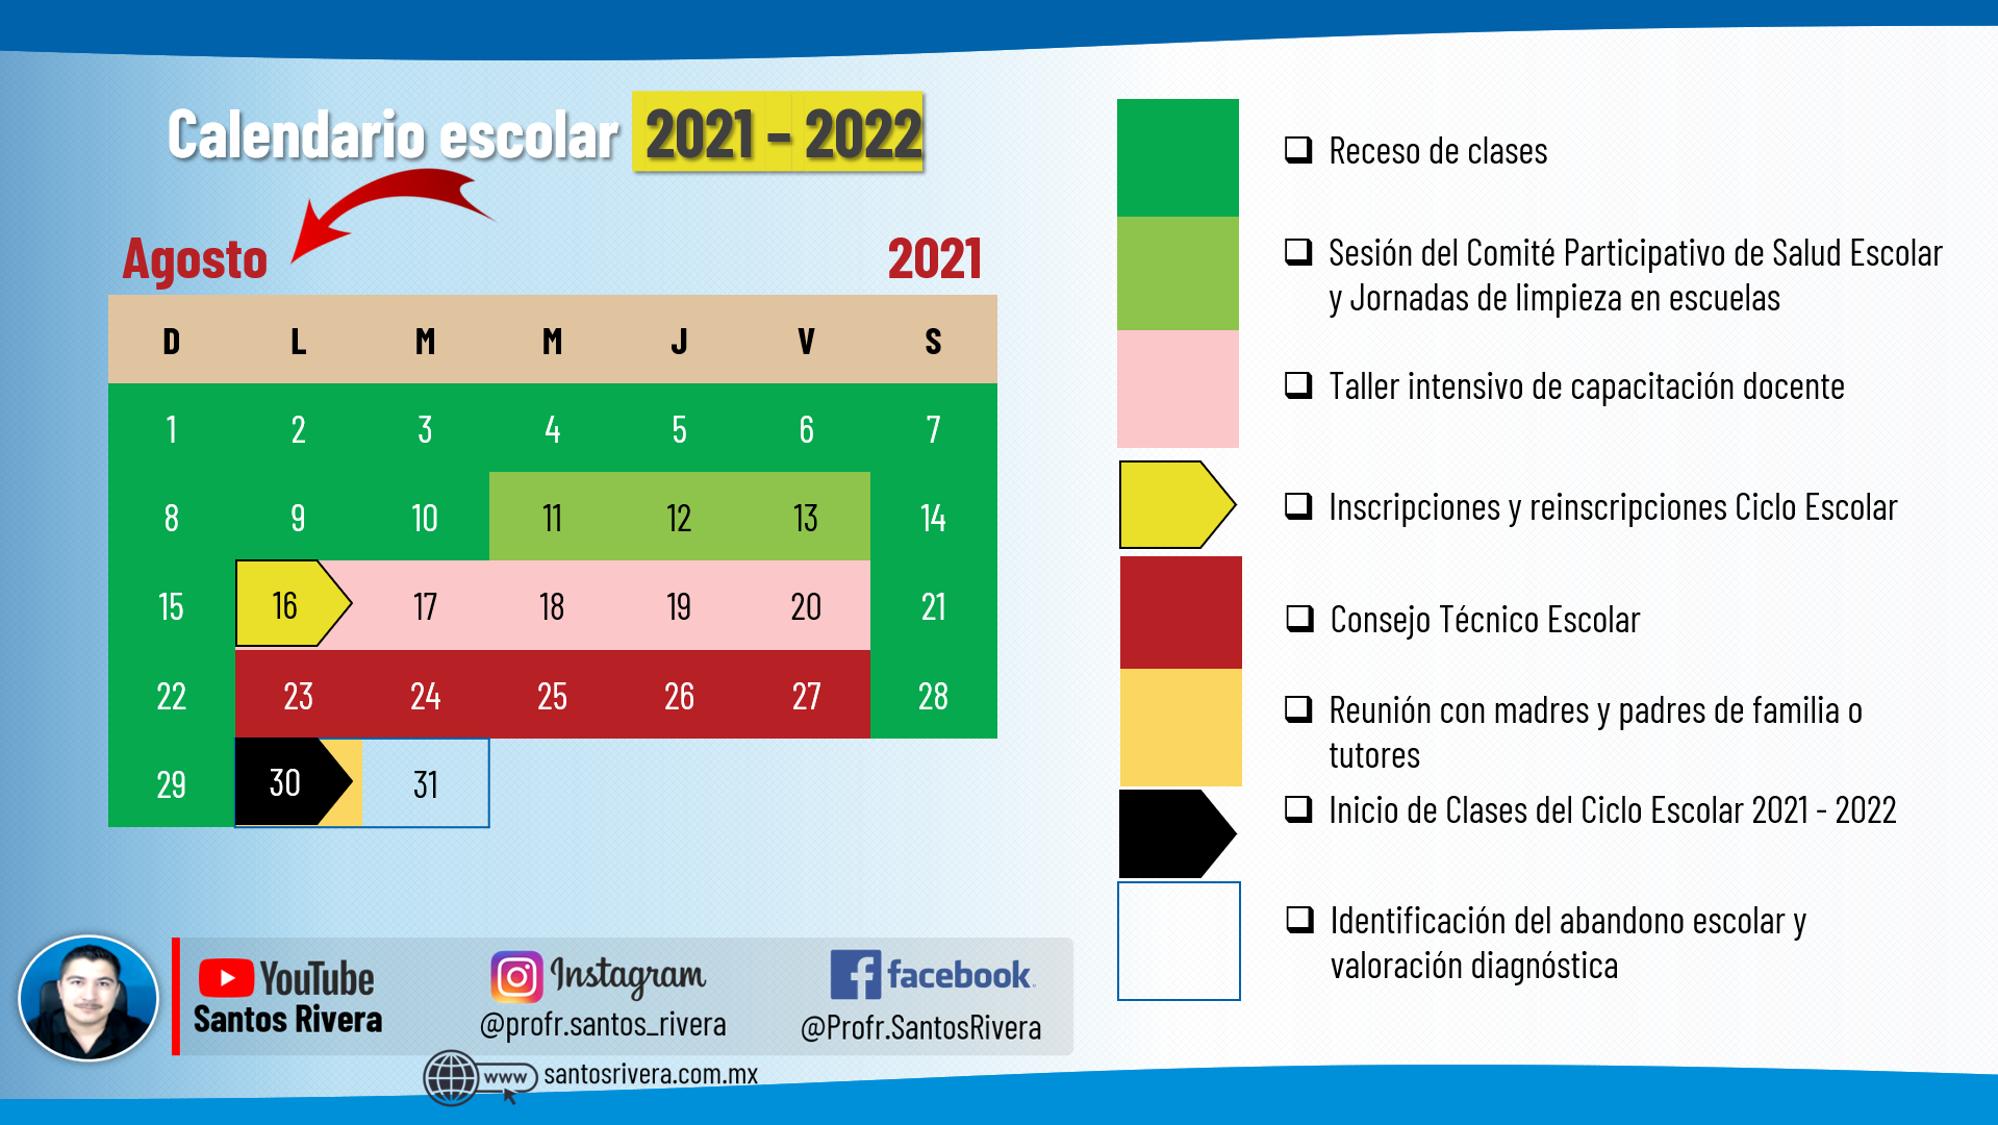 calendario escolar del mes de agosto 2021 - 2022